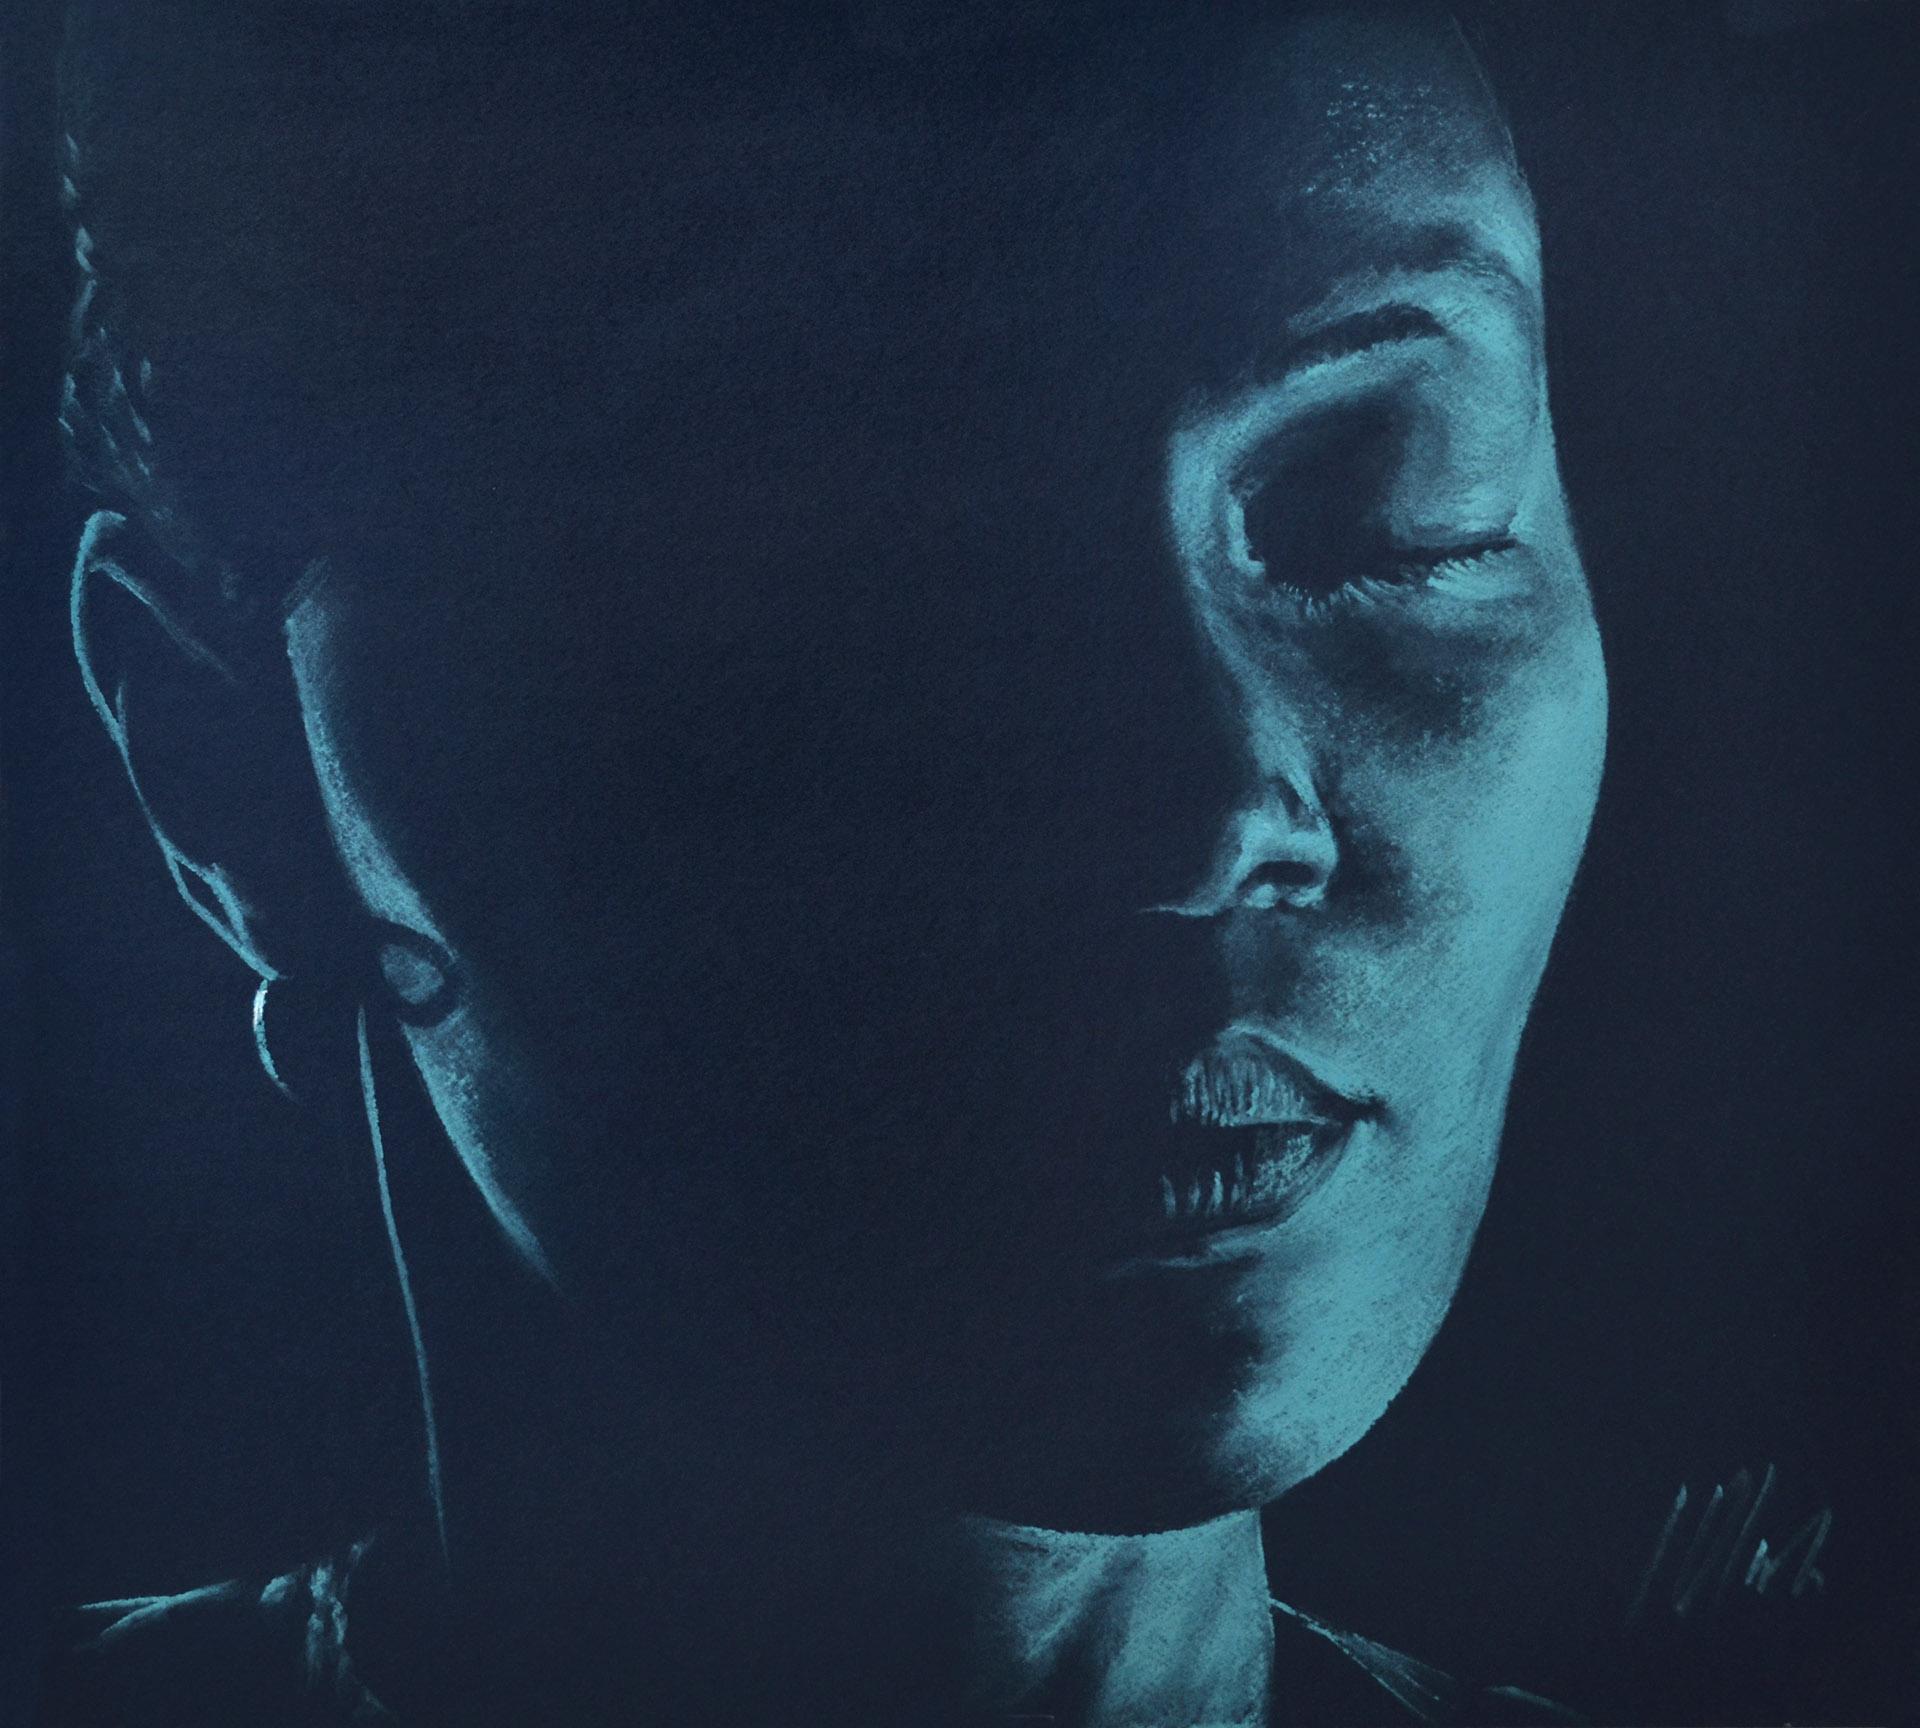 Javier Olmedo, pastel turquesa sobre azul oscuro. 50 x 45 cm. 2017. PV 155 €